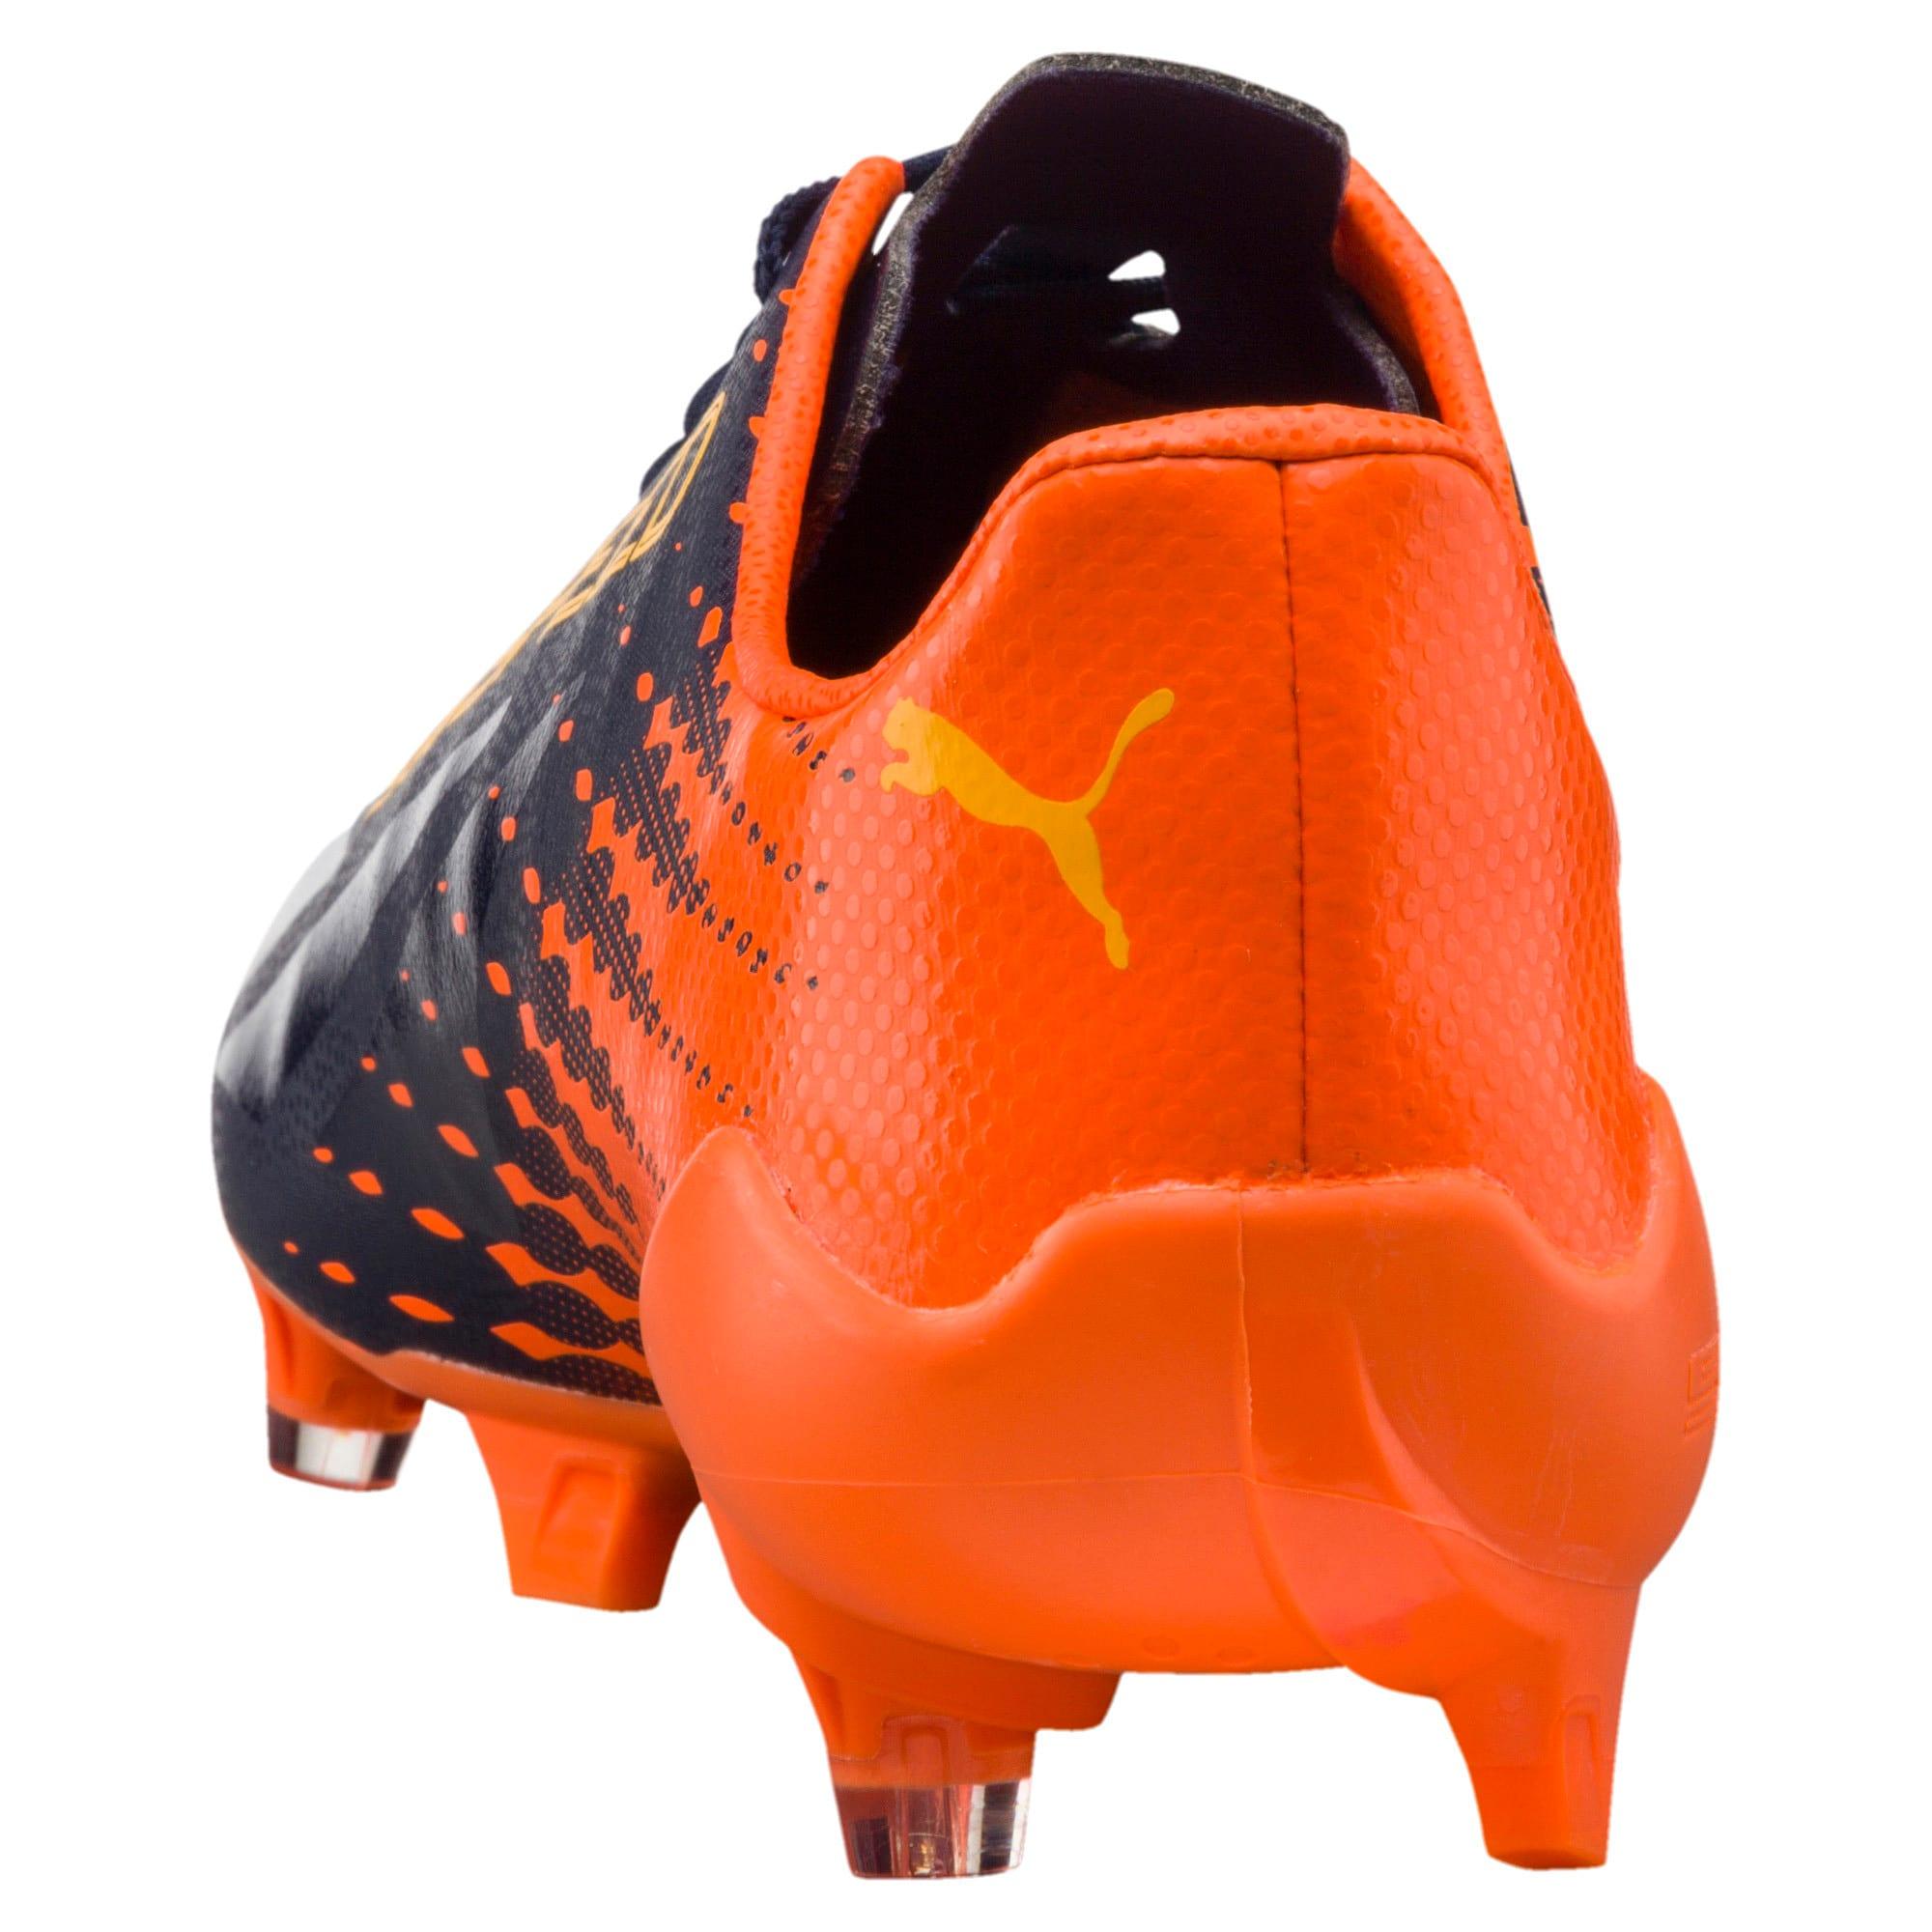 Thumbnail 4 of evoSPEED 17 SL-S FG Men's Football Boots, YELLOW-Peacoat-Orange, medium-IND